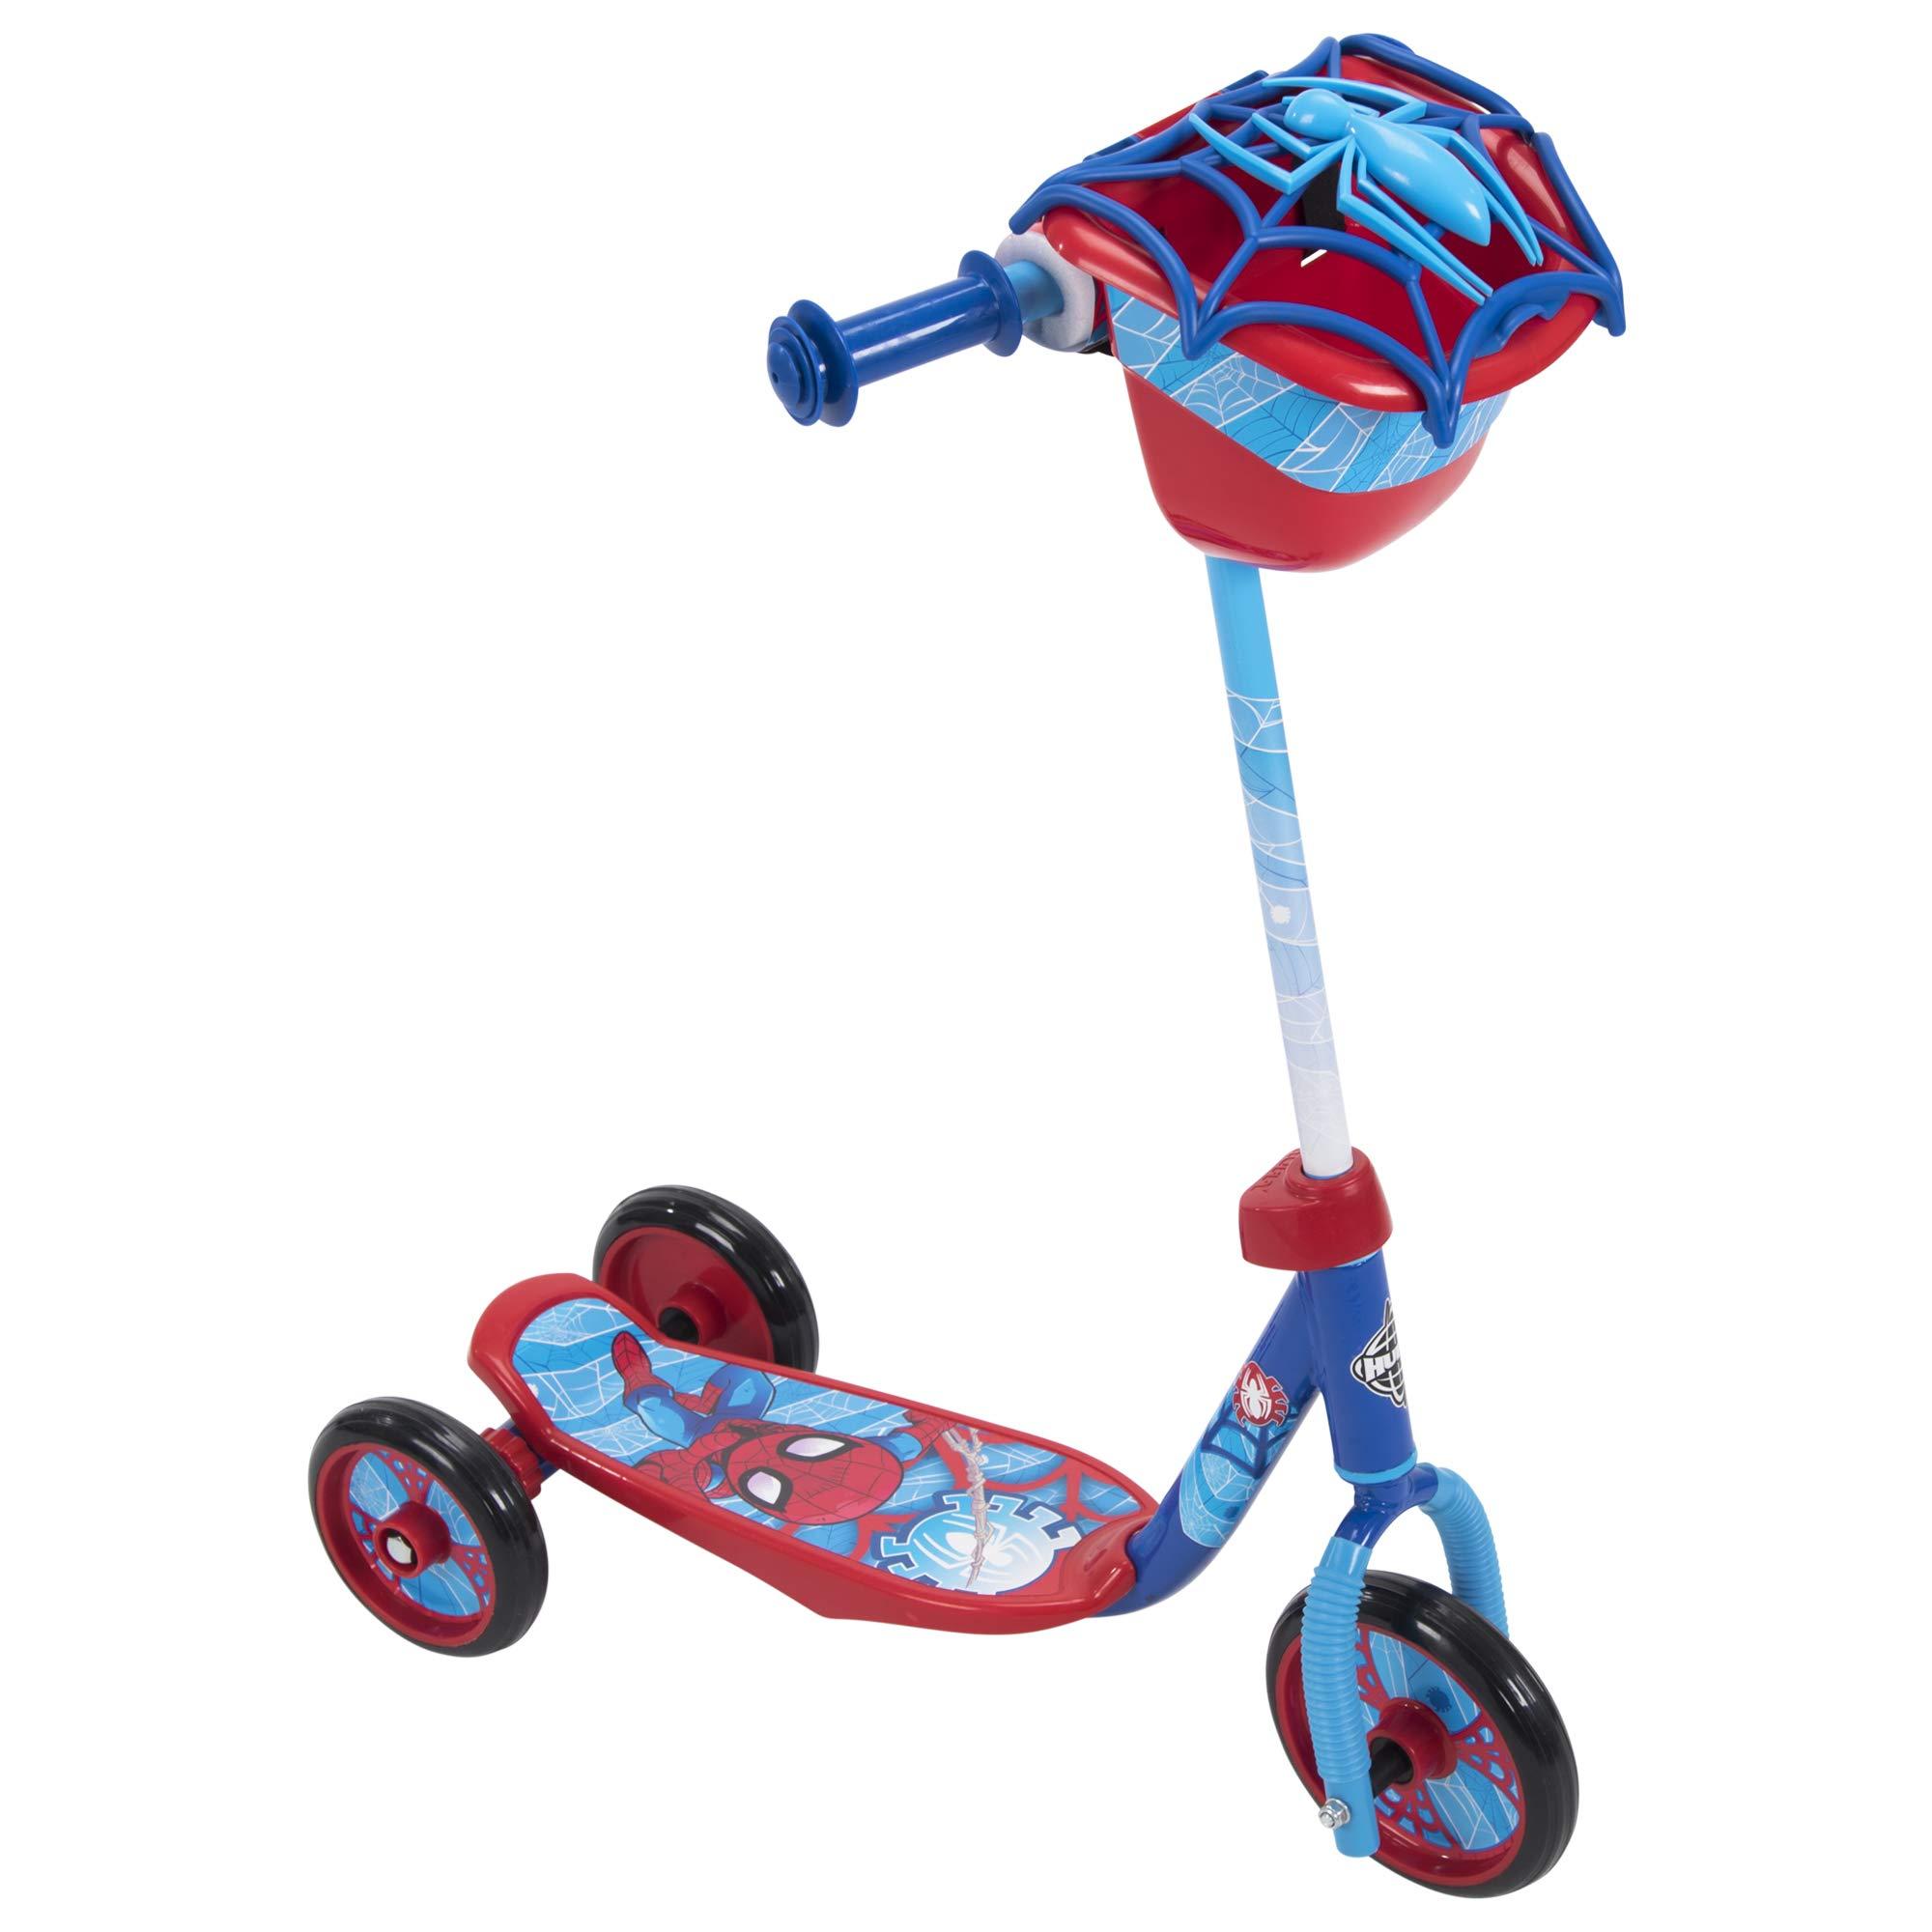 Huffy Kids - Patinete preescolar para niños Disney Pixar Cars & Toy Story, Star Wars, Marvel Spider-Man, juguete de 3 ruedas